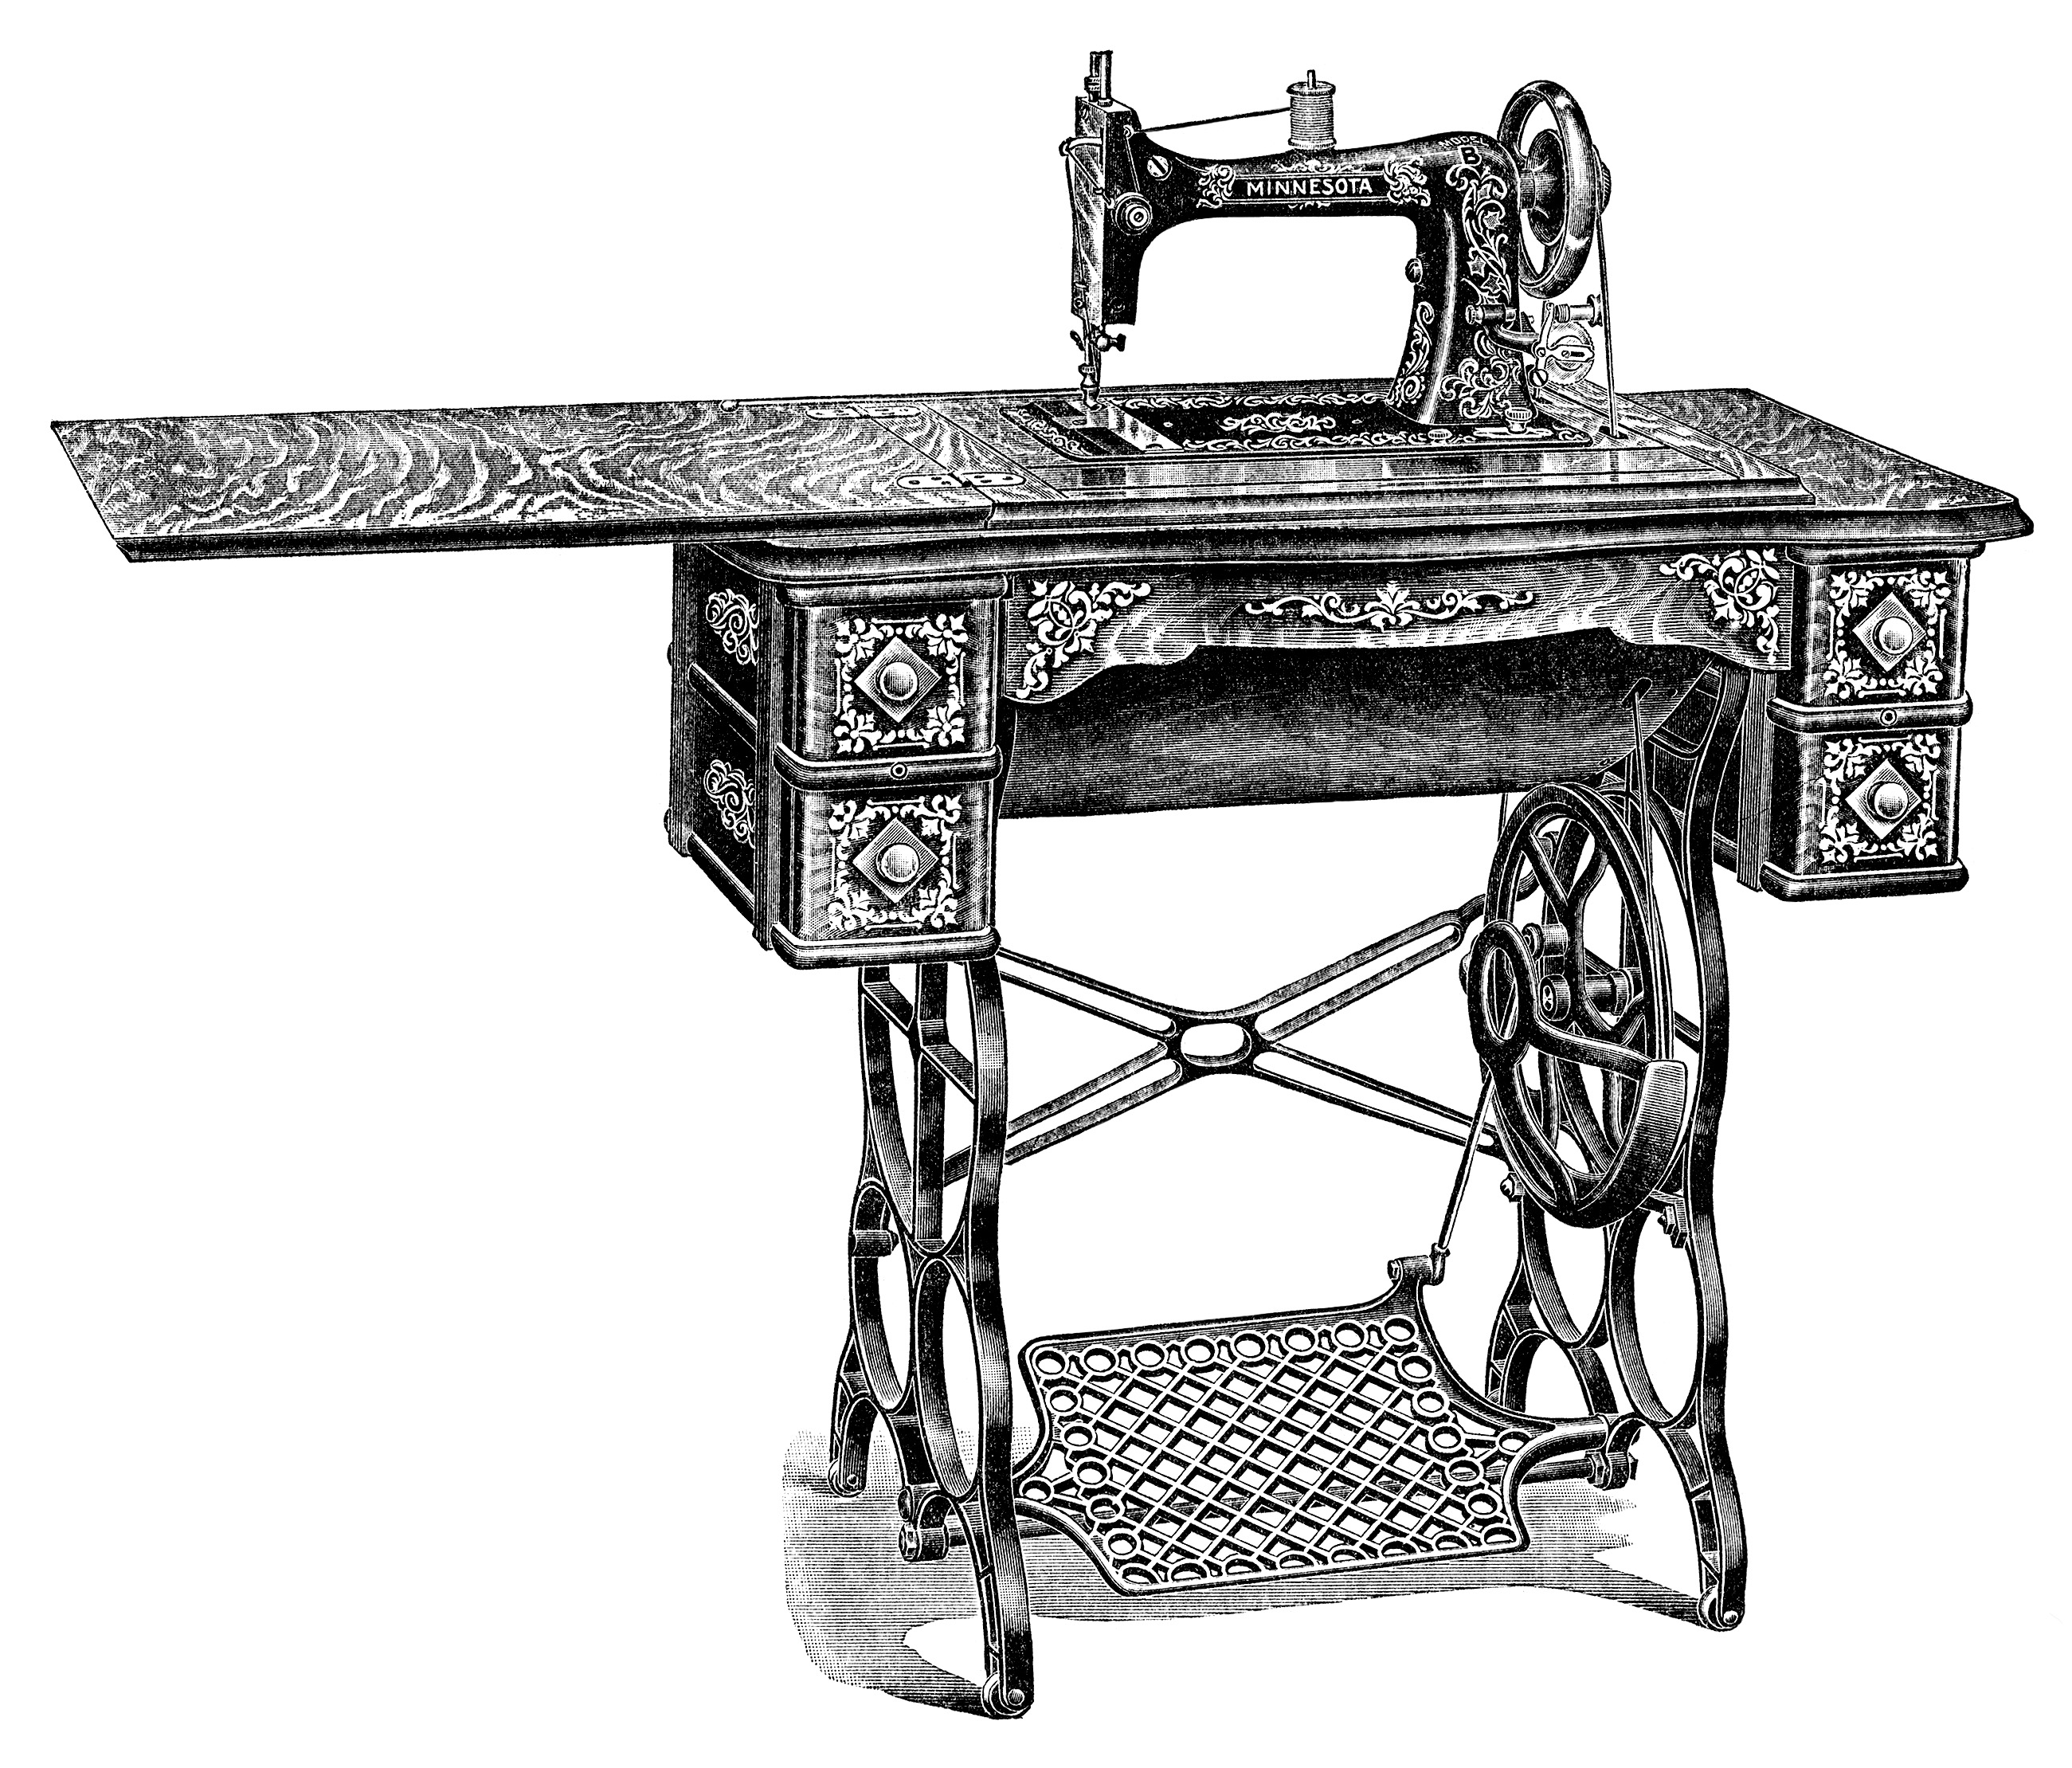 Clipart vintage sewing machine transparent stock Vintage Sewing Machine Clip Art - Old Design Shop Blog transparent stock